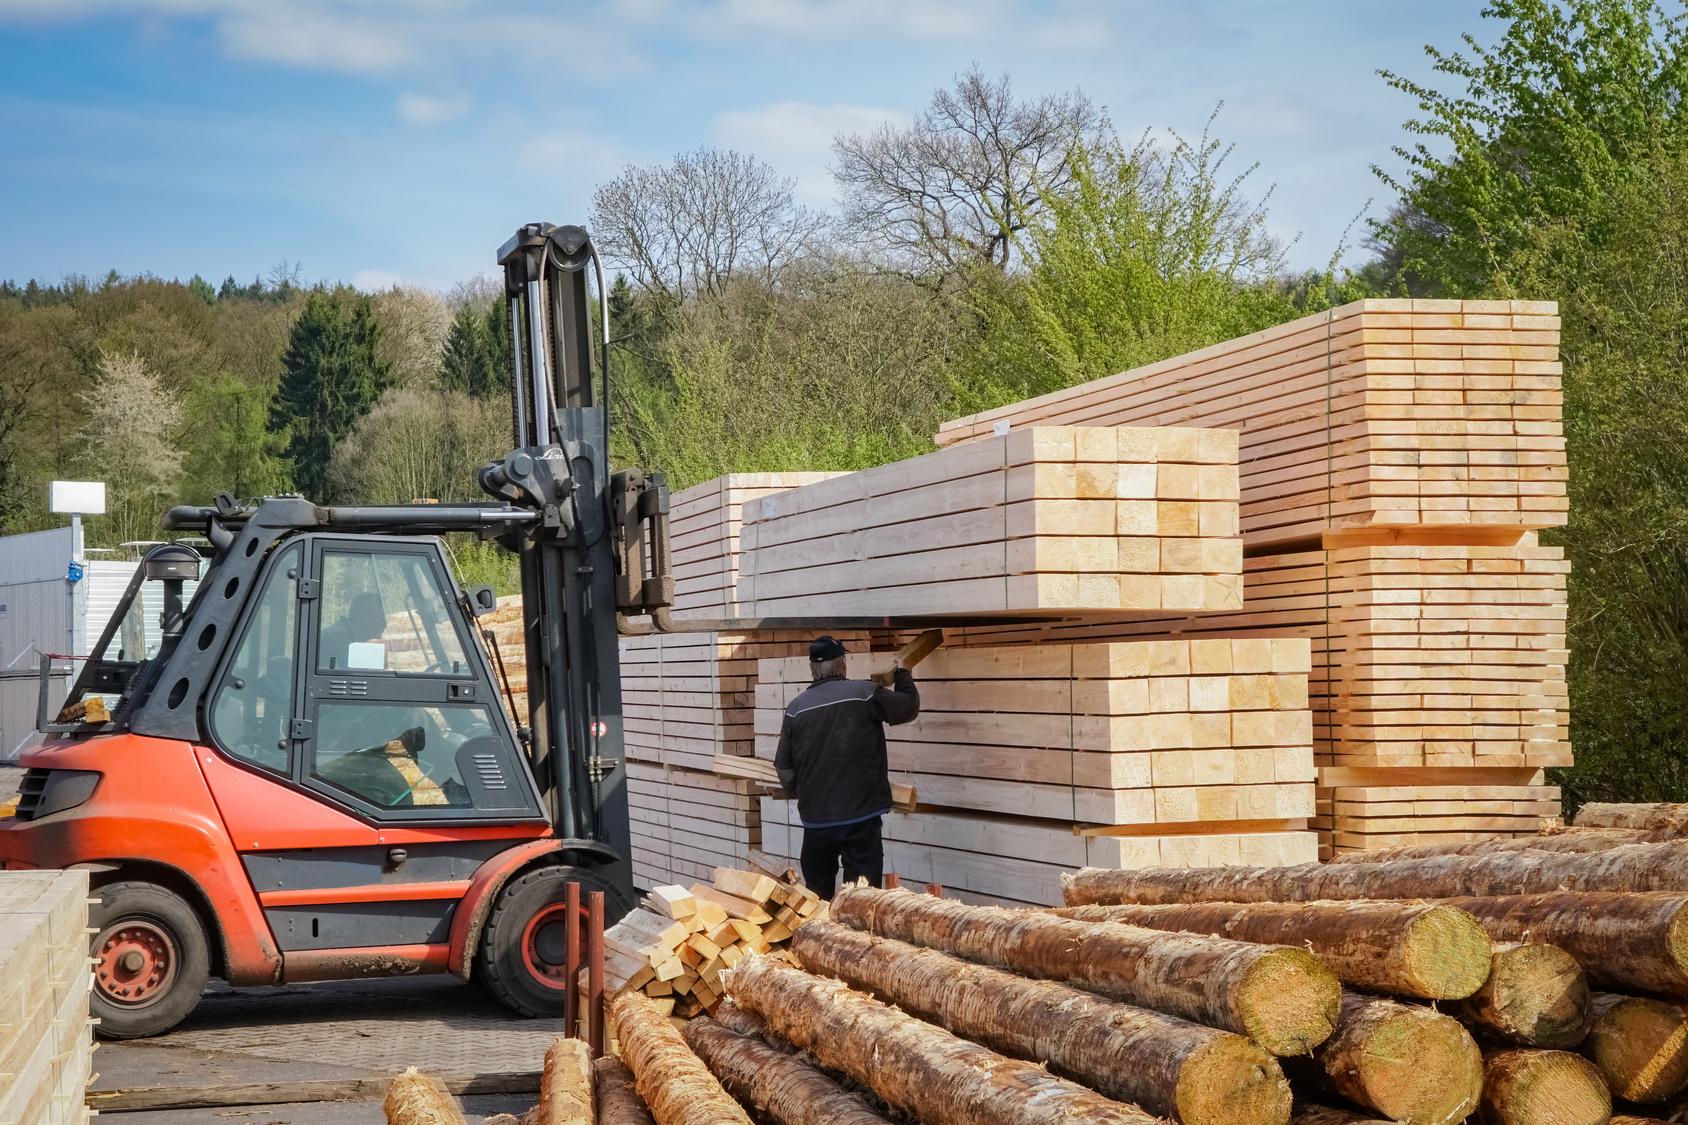 Holzindustrie Sägewerk, Bauholz Wird Gestapelt